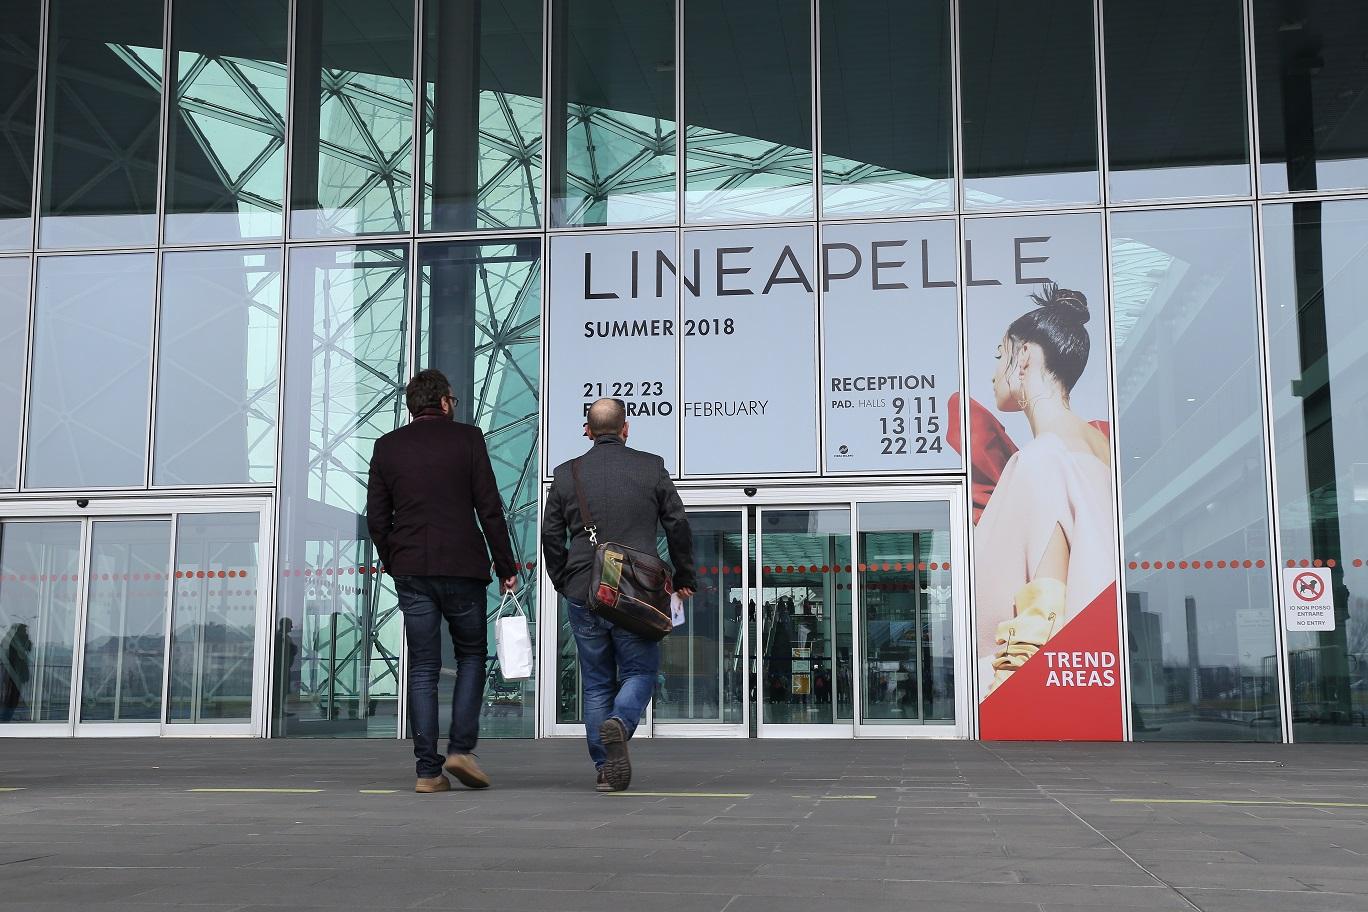 THRAKON CARMYFIX Συμμετοχή στη Διεθνή Έκθεση LINEAPELLE 2017 στο Μιλάνο (4)